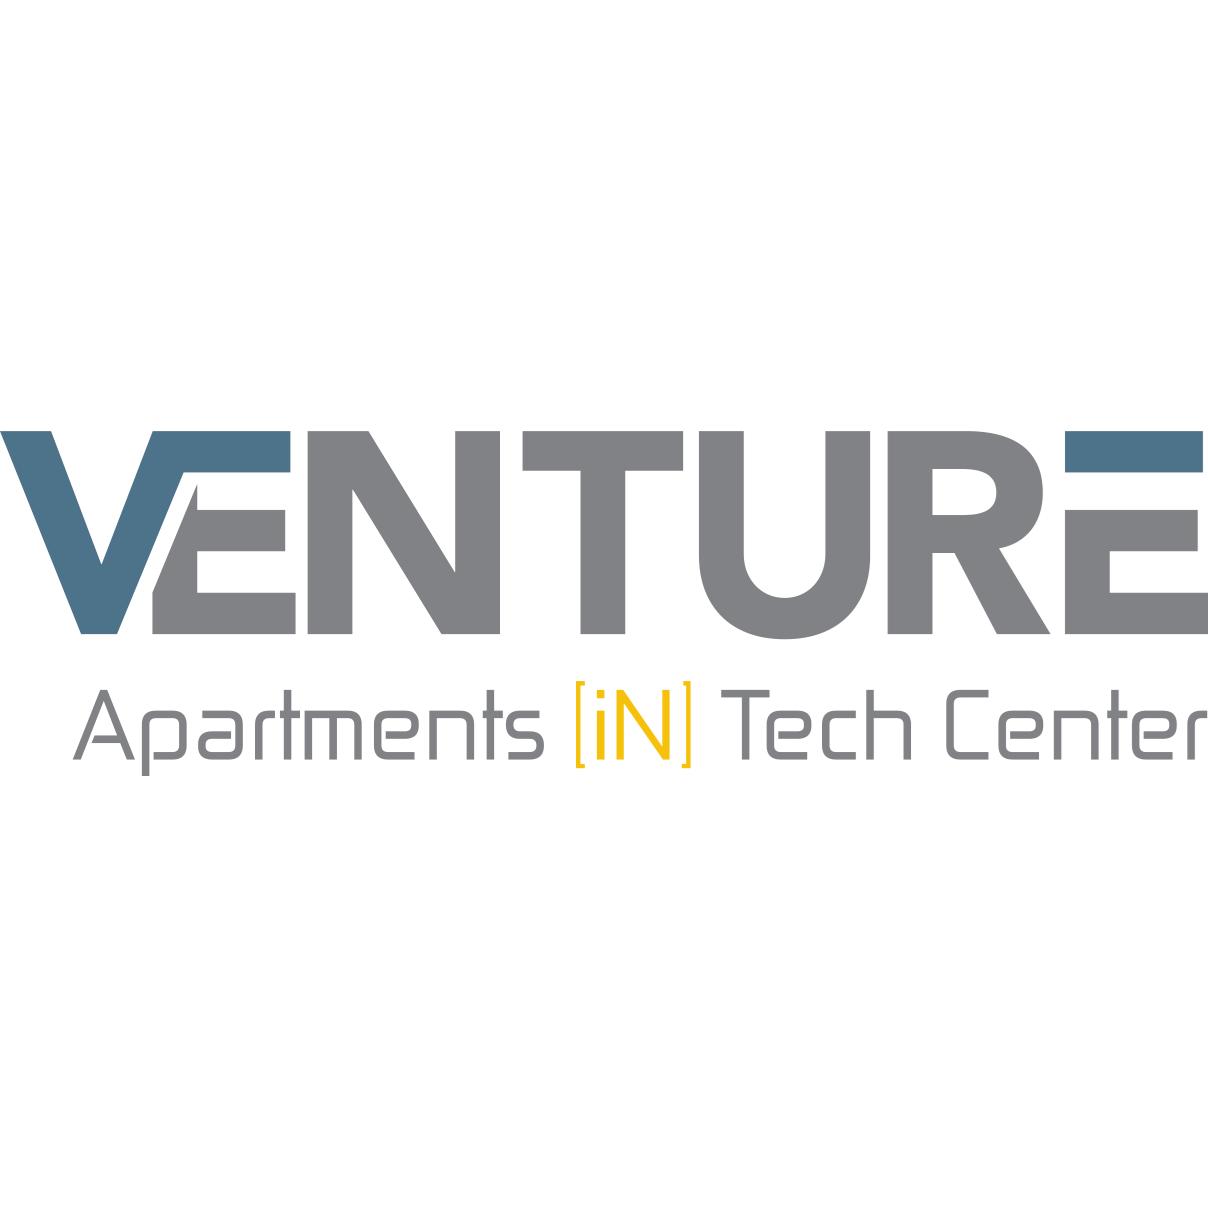 Venture Apartments iN Tech Center